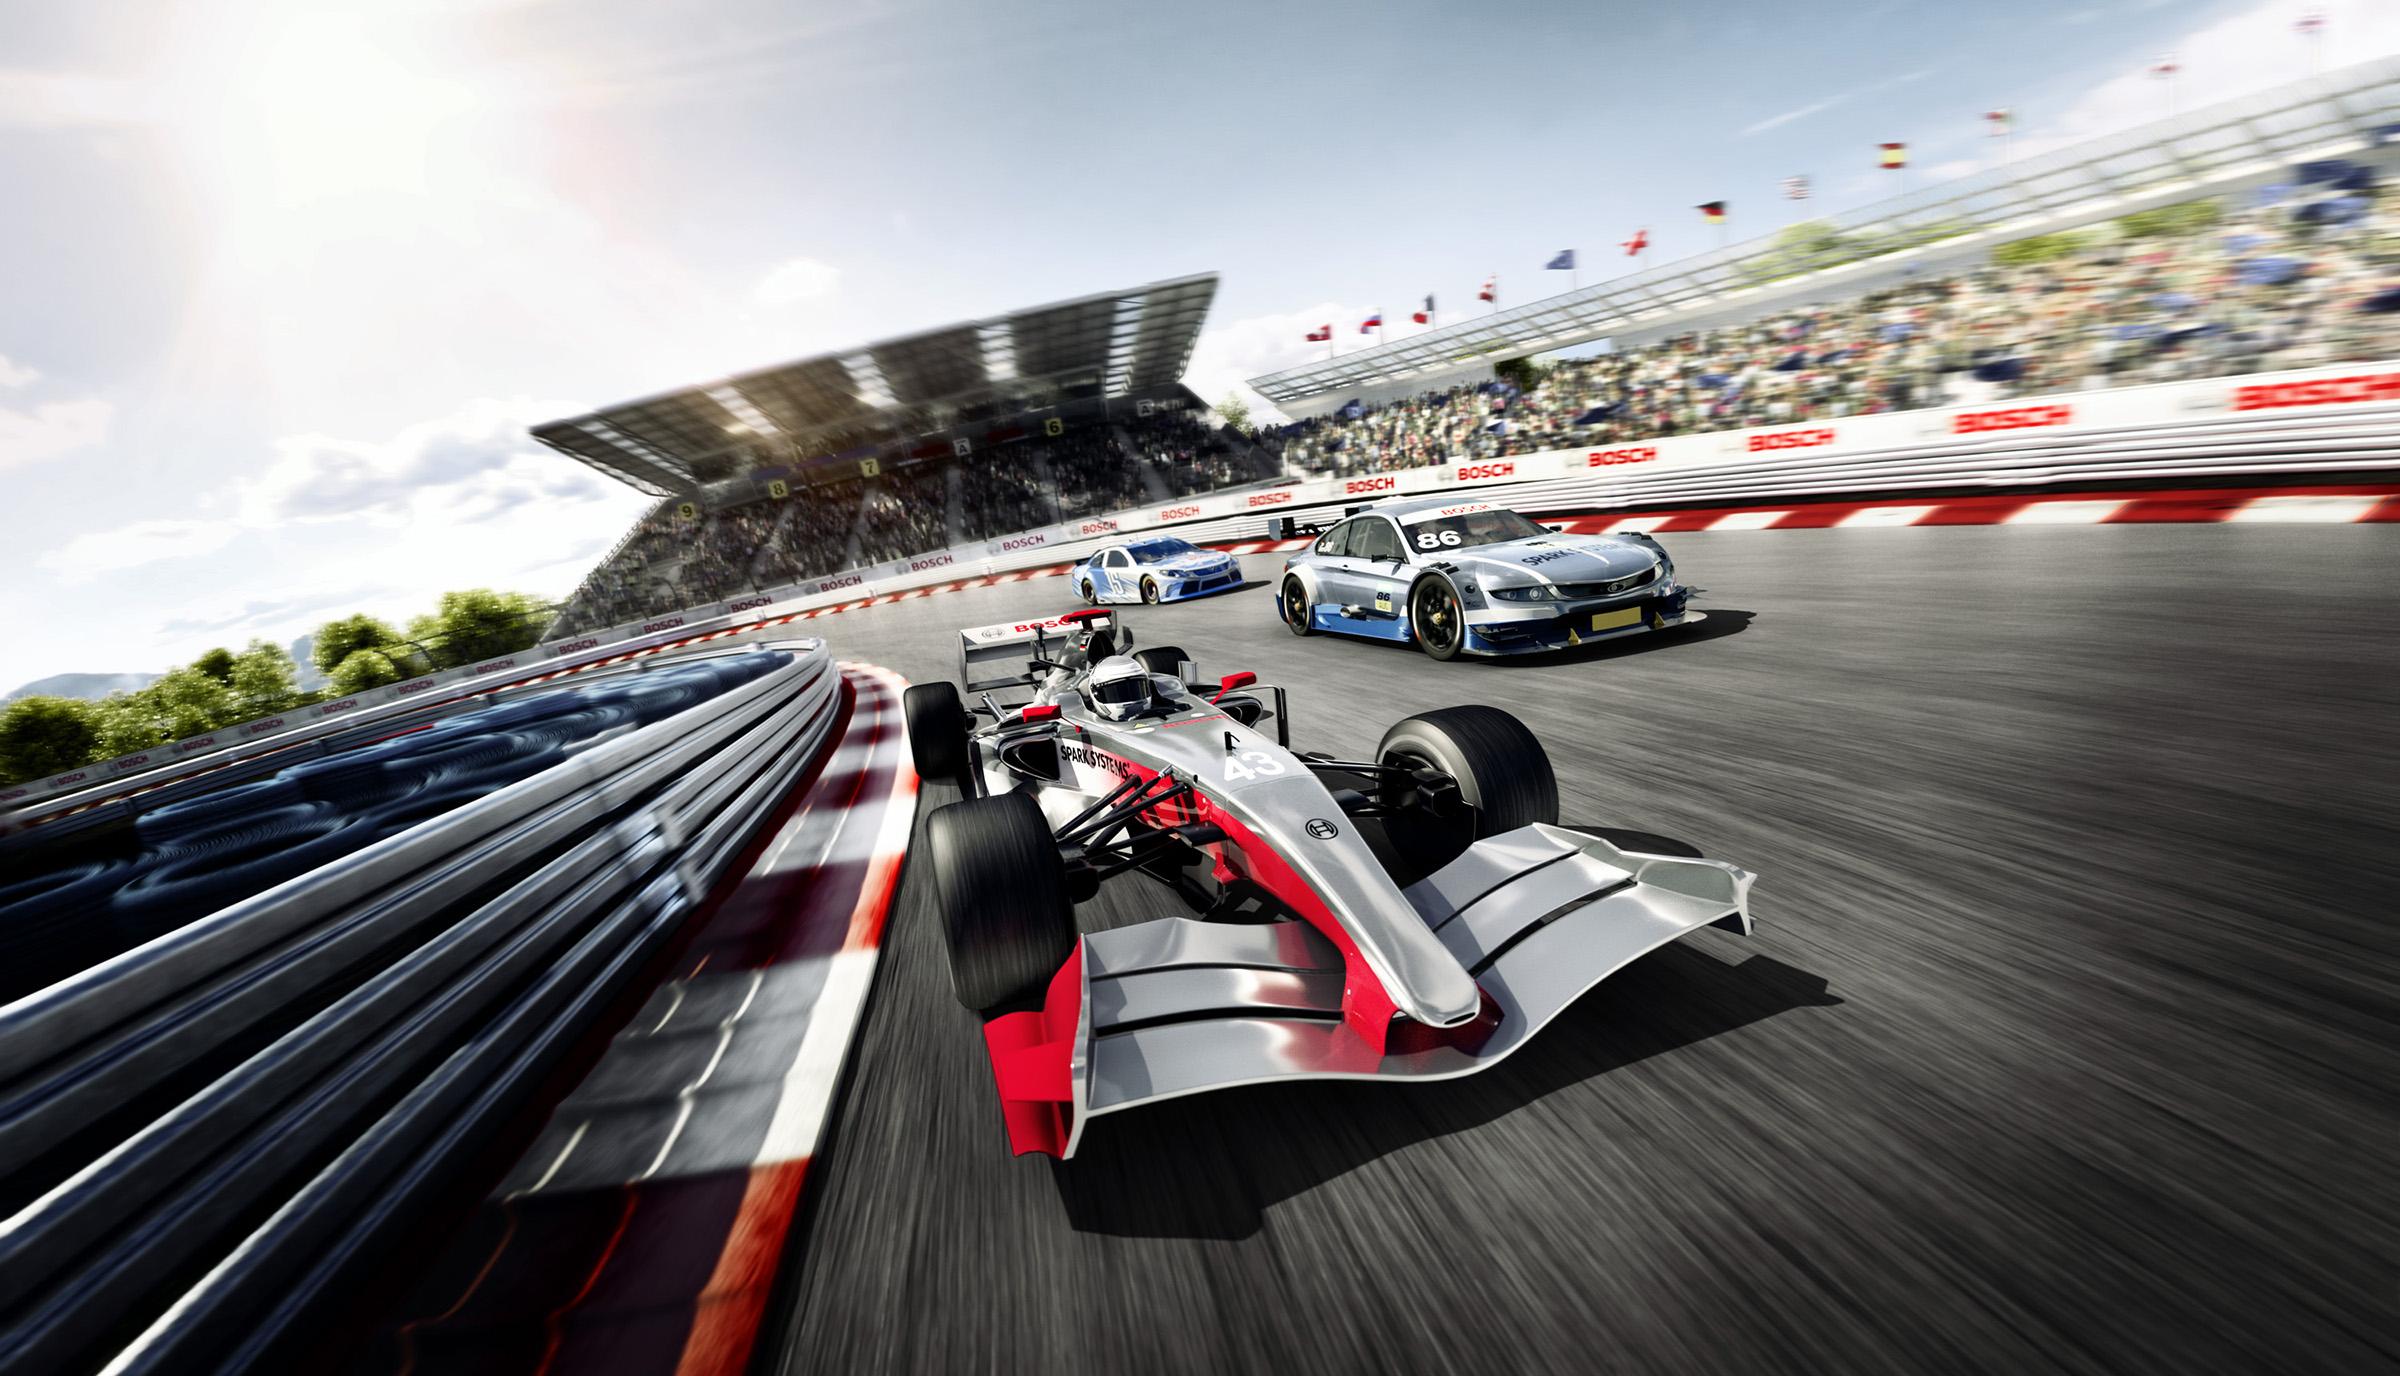 BOSCH_racetrack_2400_169_TAG